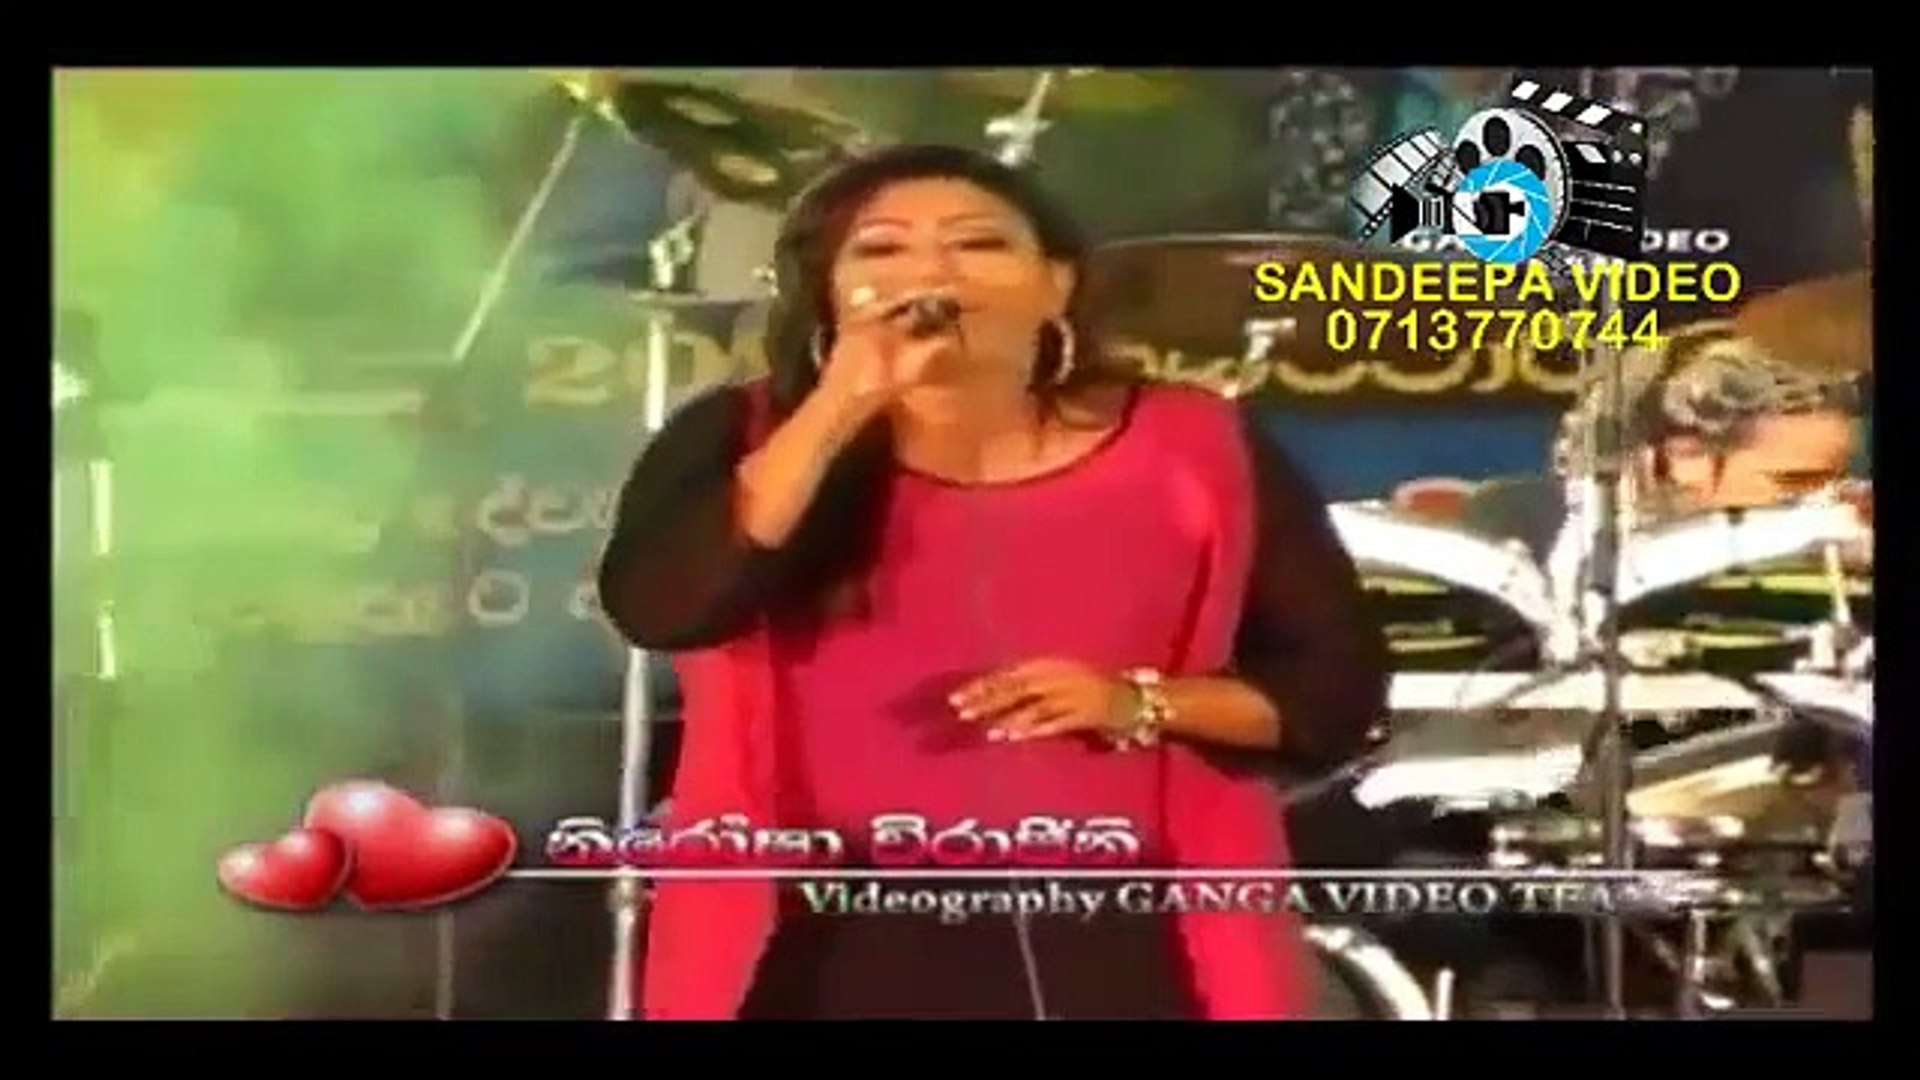 Sinhala Dj Nonstop Video Remix By Sandeepa Videos